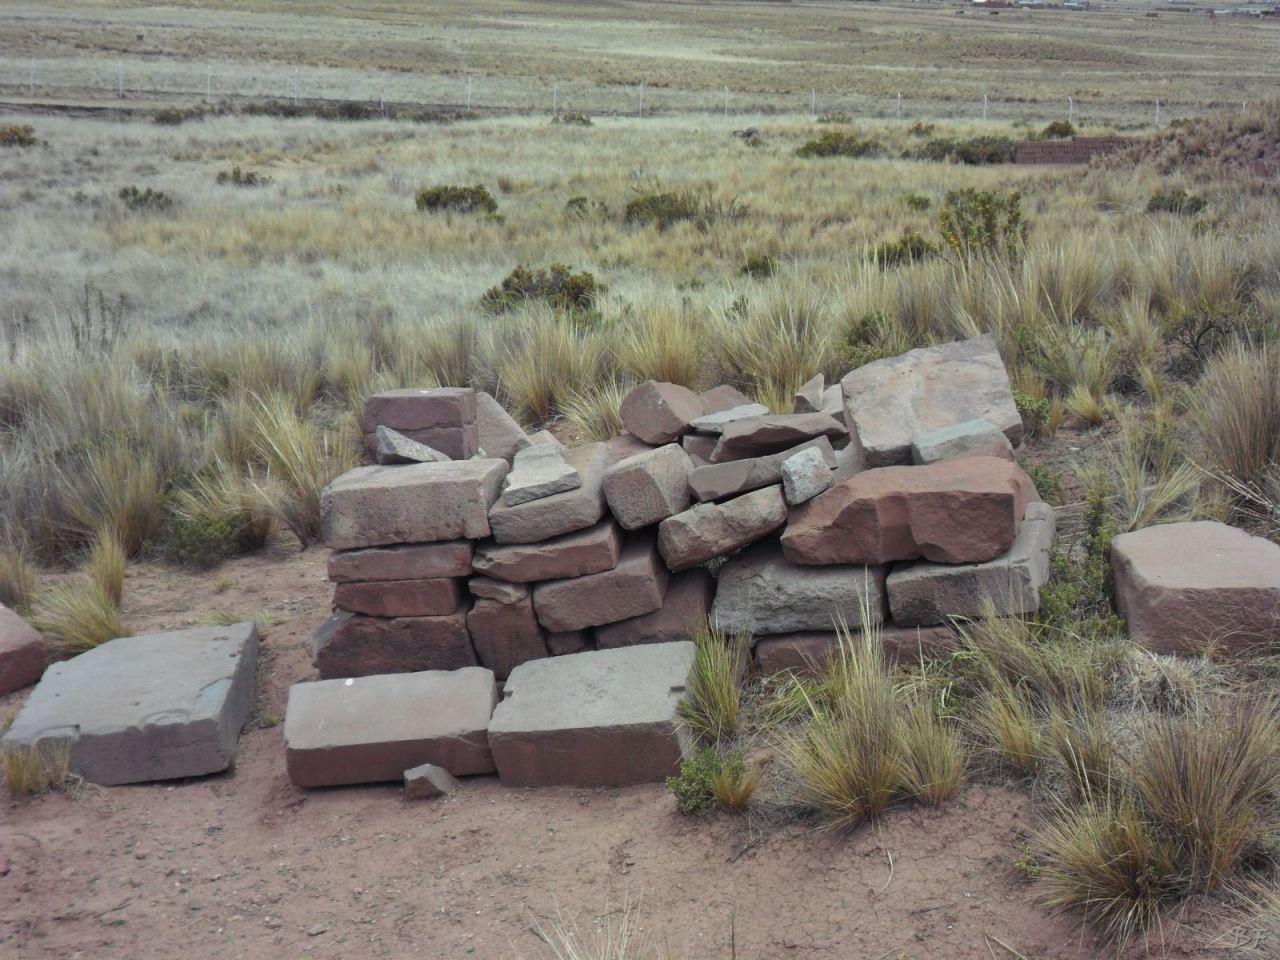 Sito-Megalitico-Piramide-Akapana-Kalasasaya-Menhir-Tiahuanaco-Bolivia-110